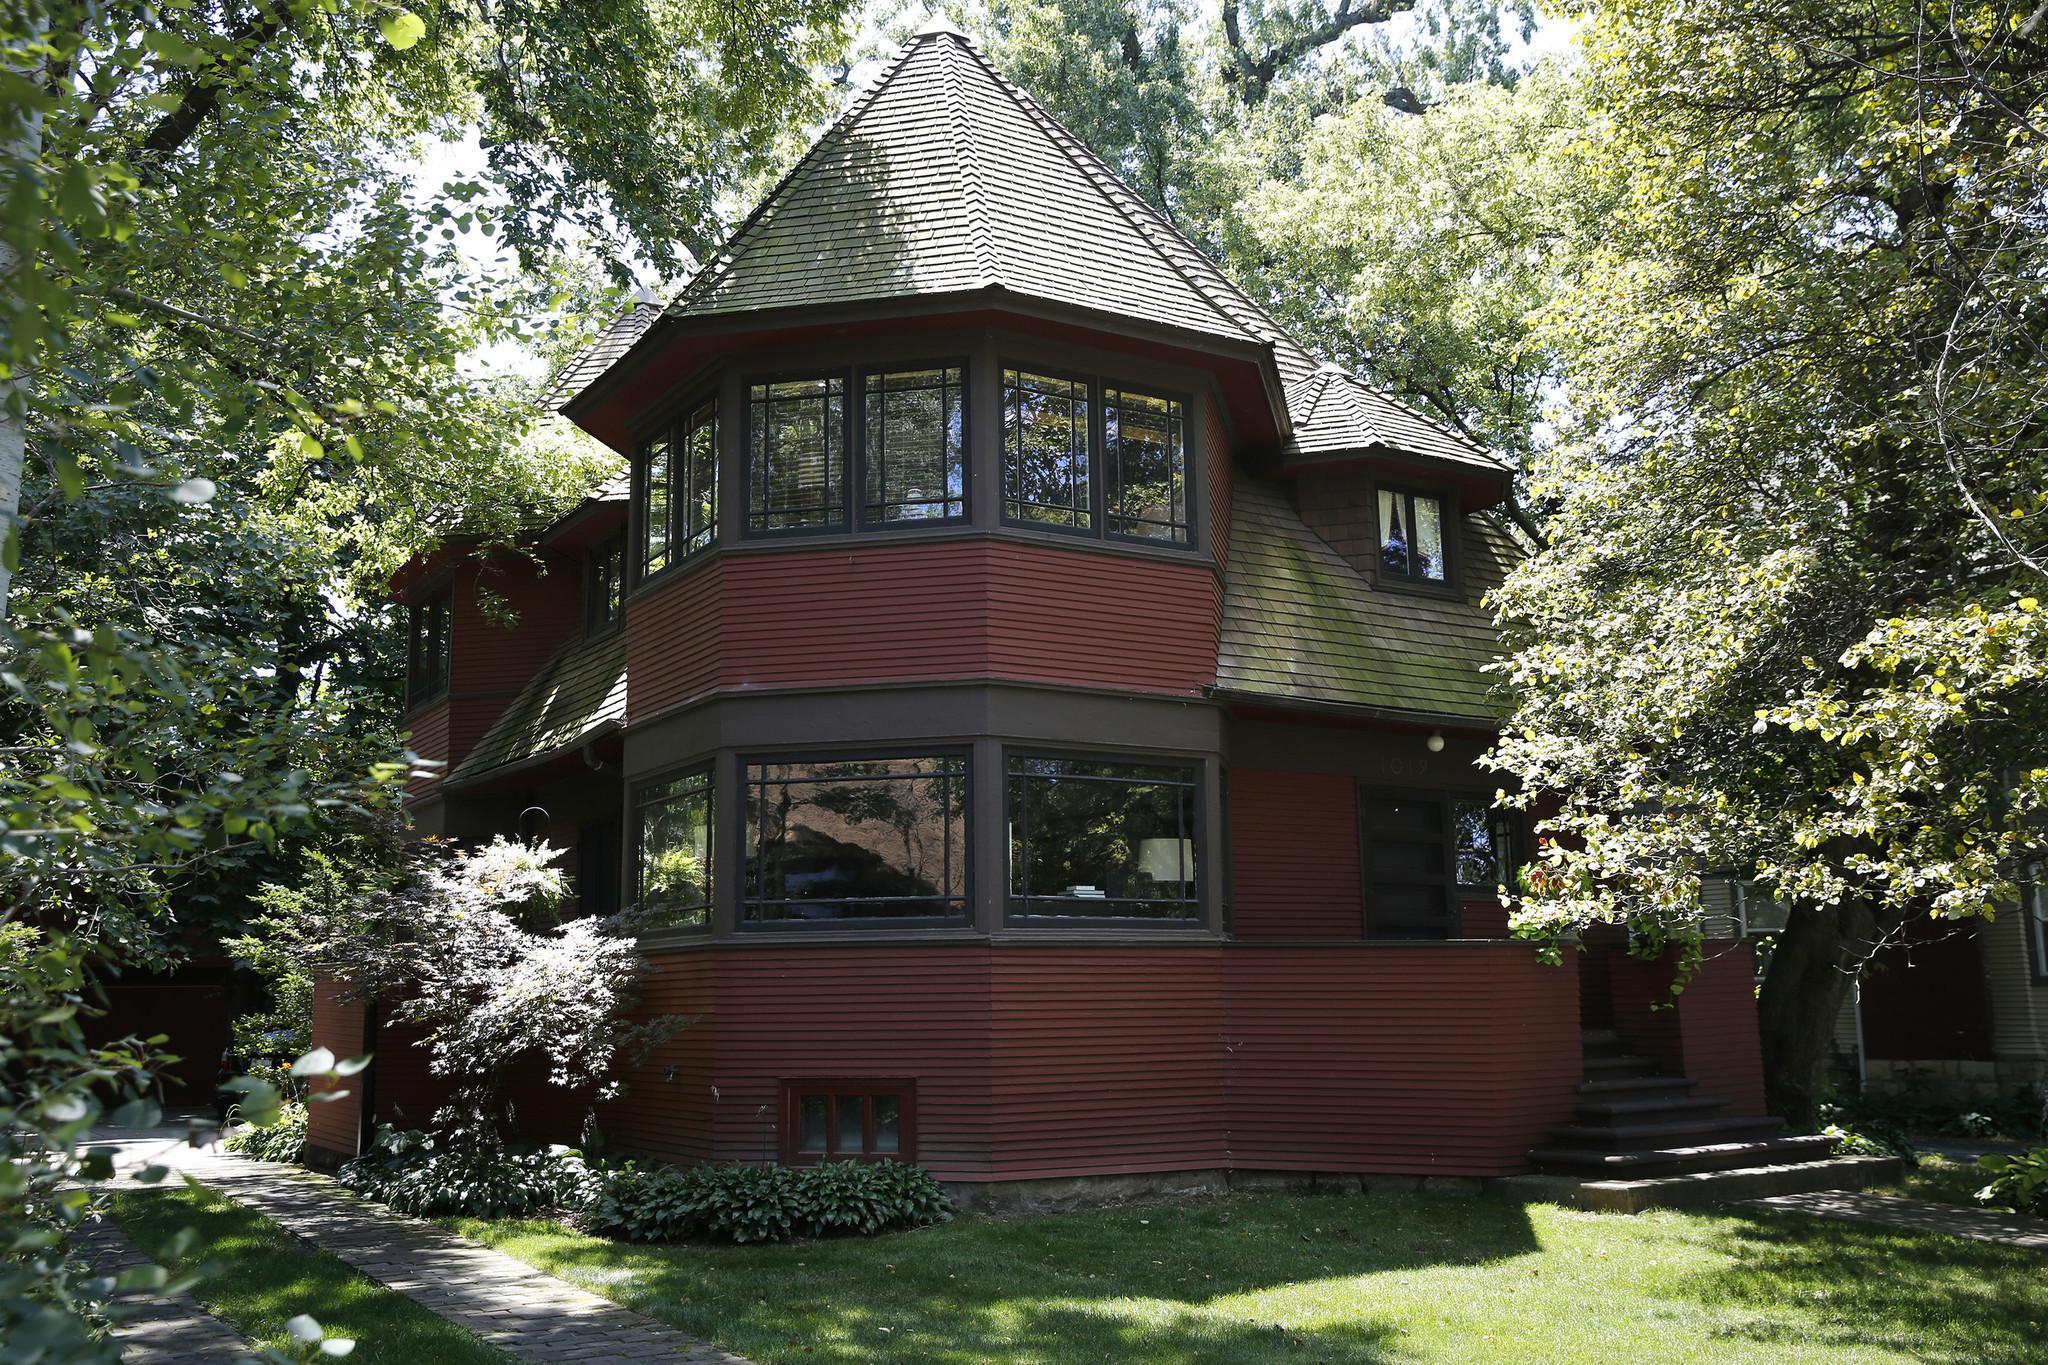 Frank Lloyd Wright's designs are hot properties again